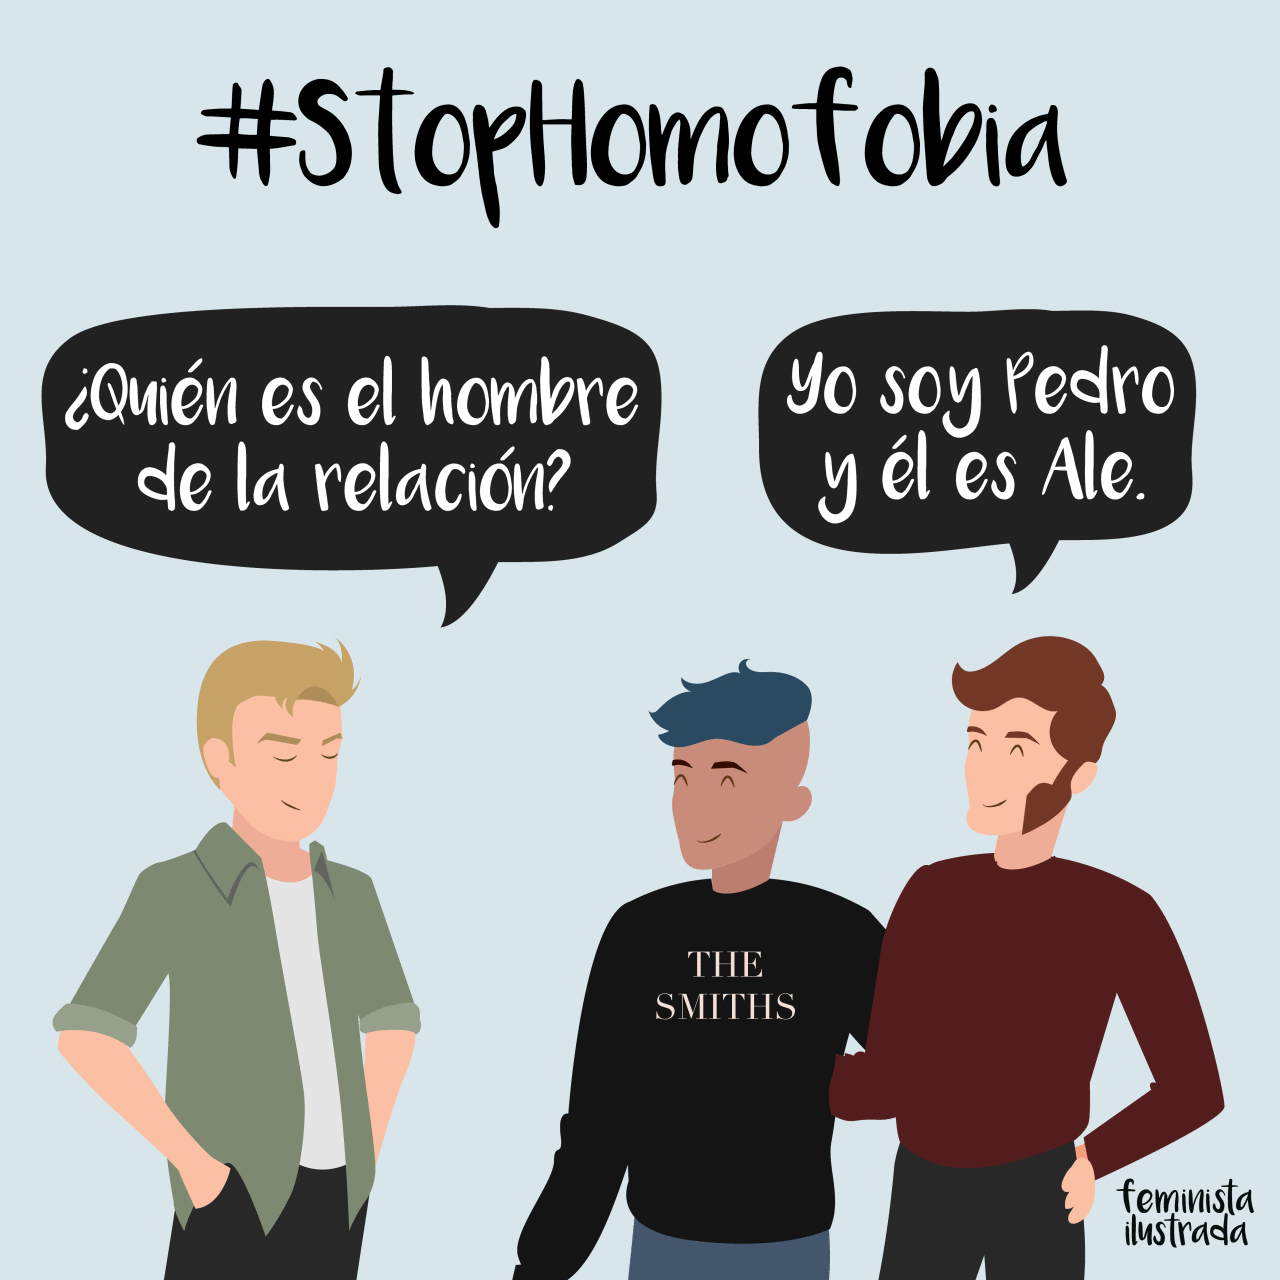 Homofobia internalizada